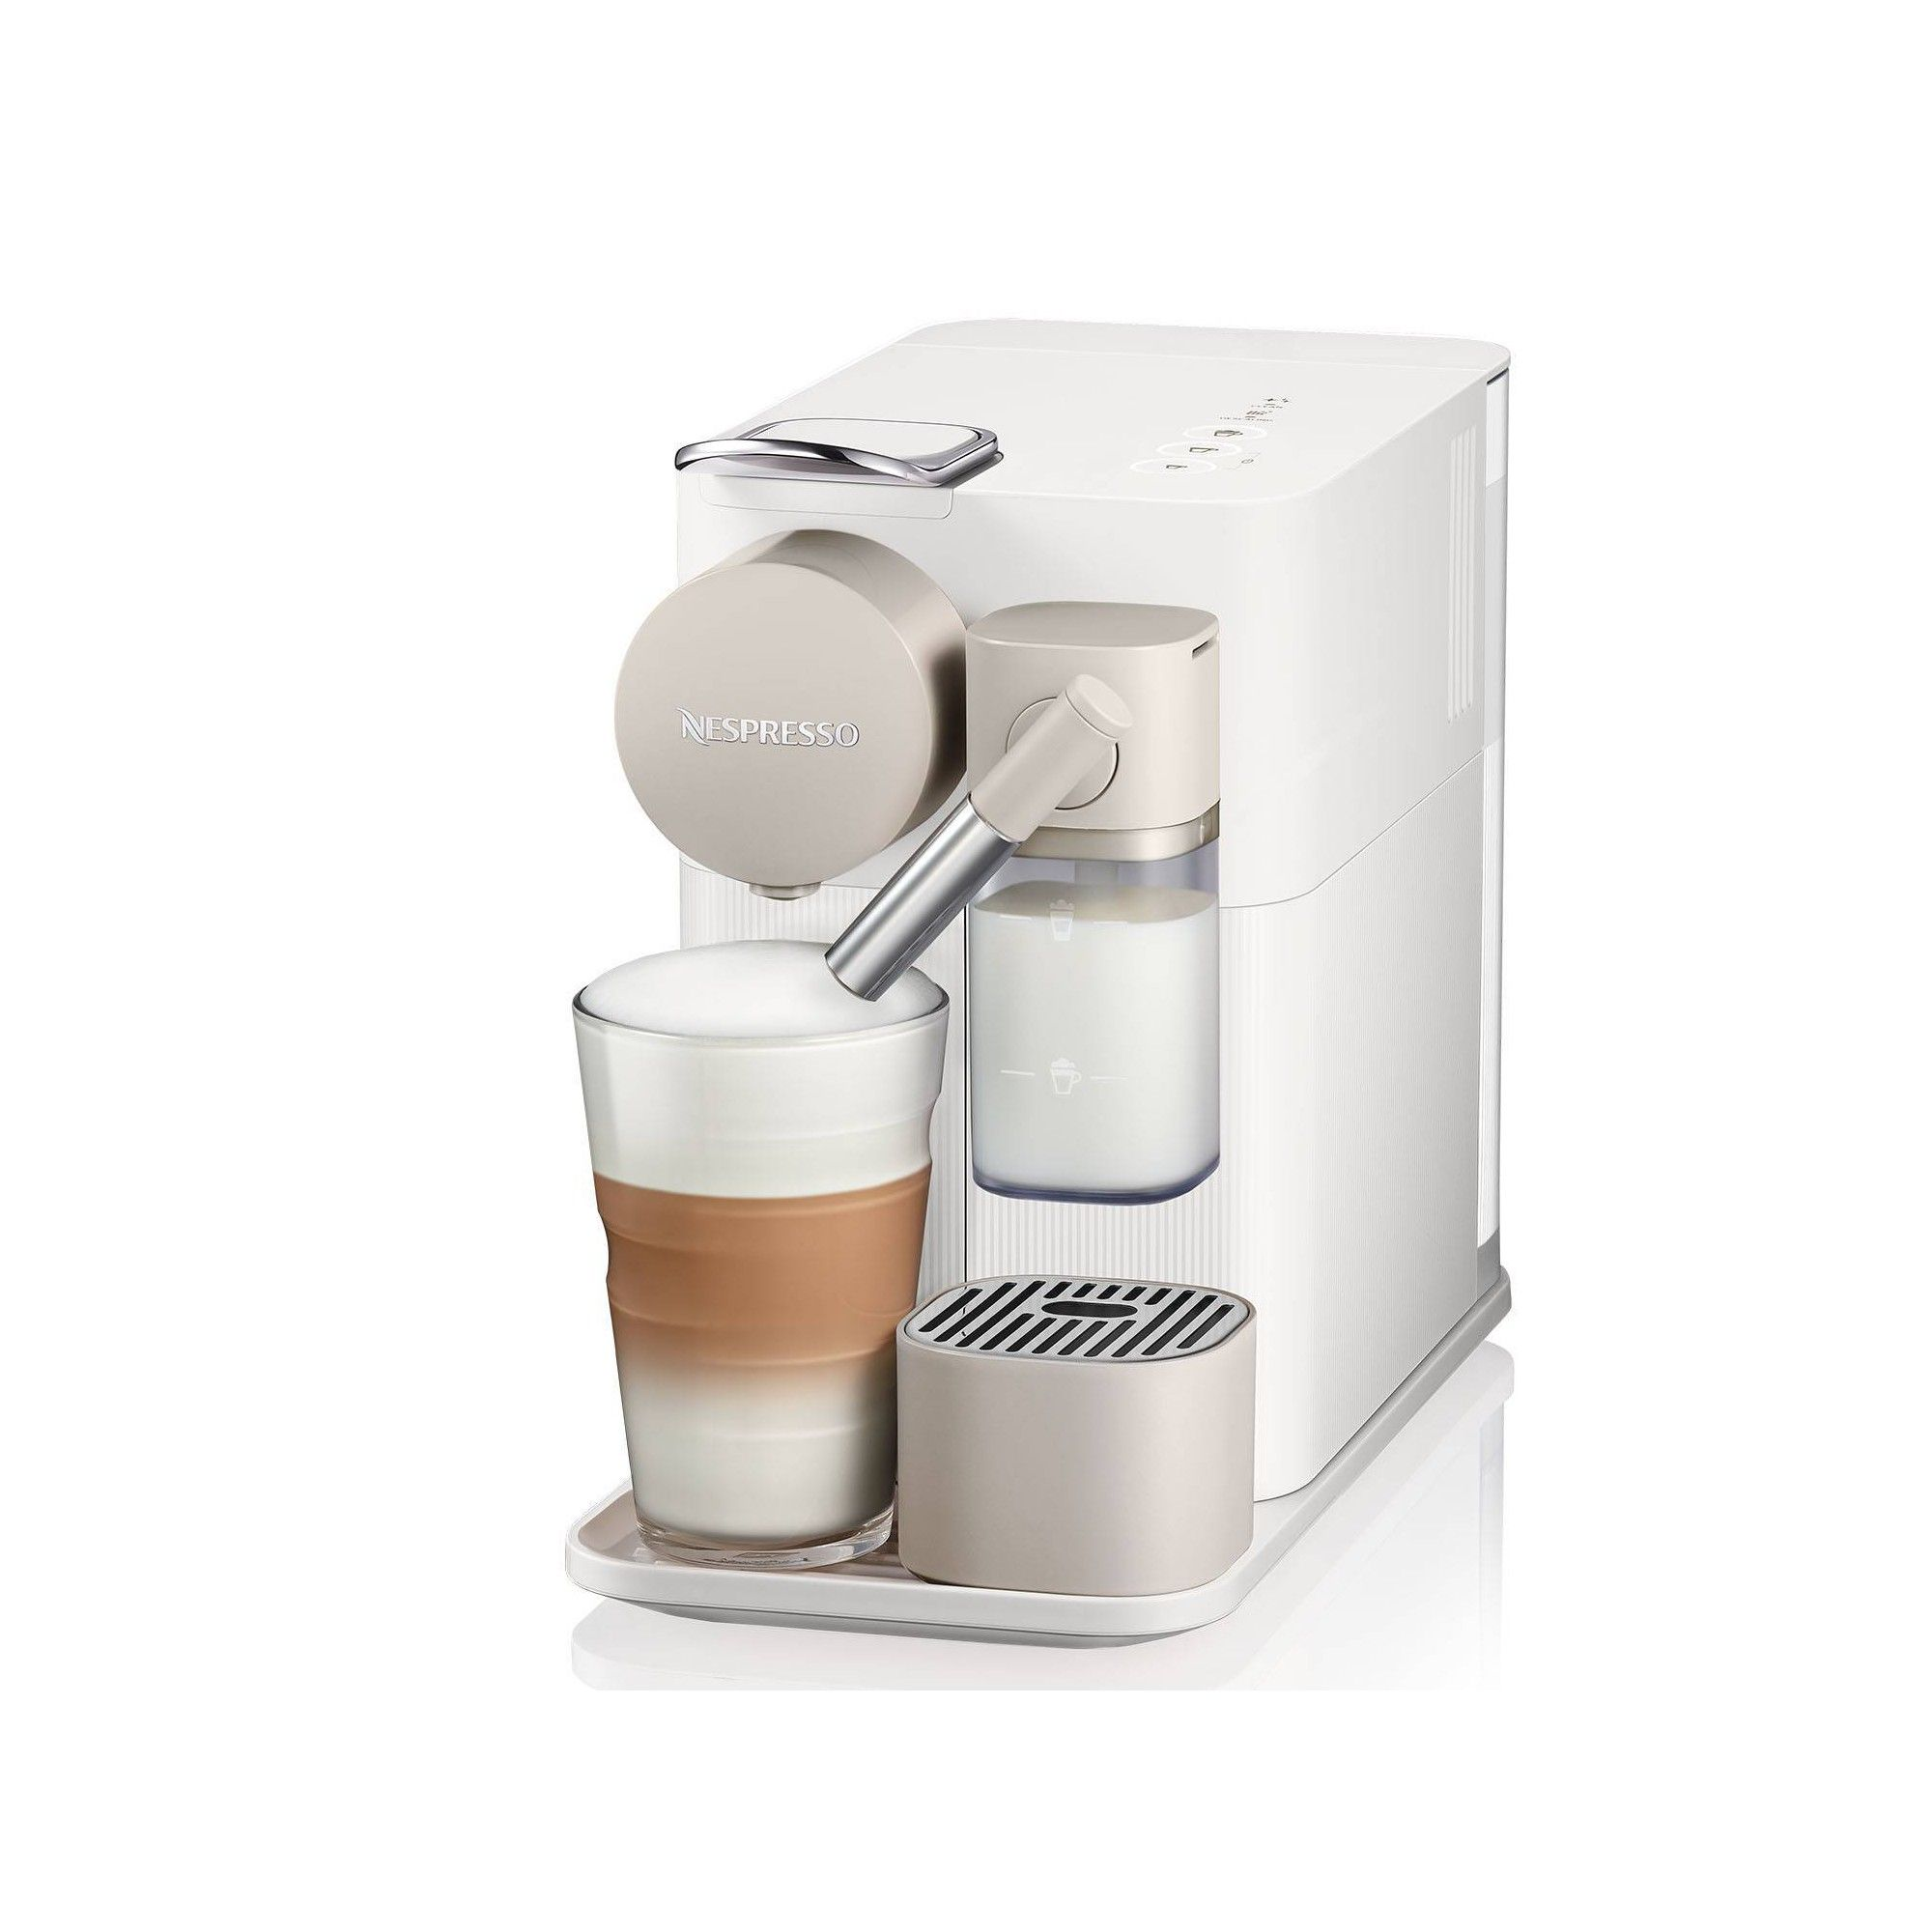 Nespresso Lattissima ONE Silky White Nespresso